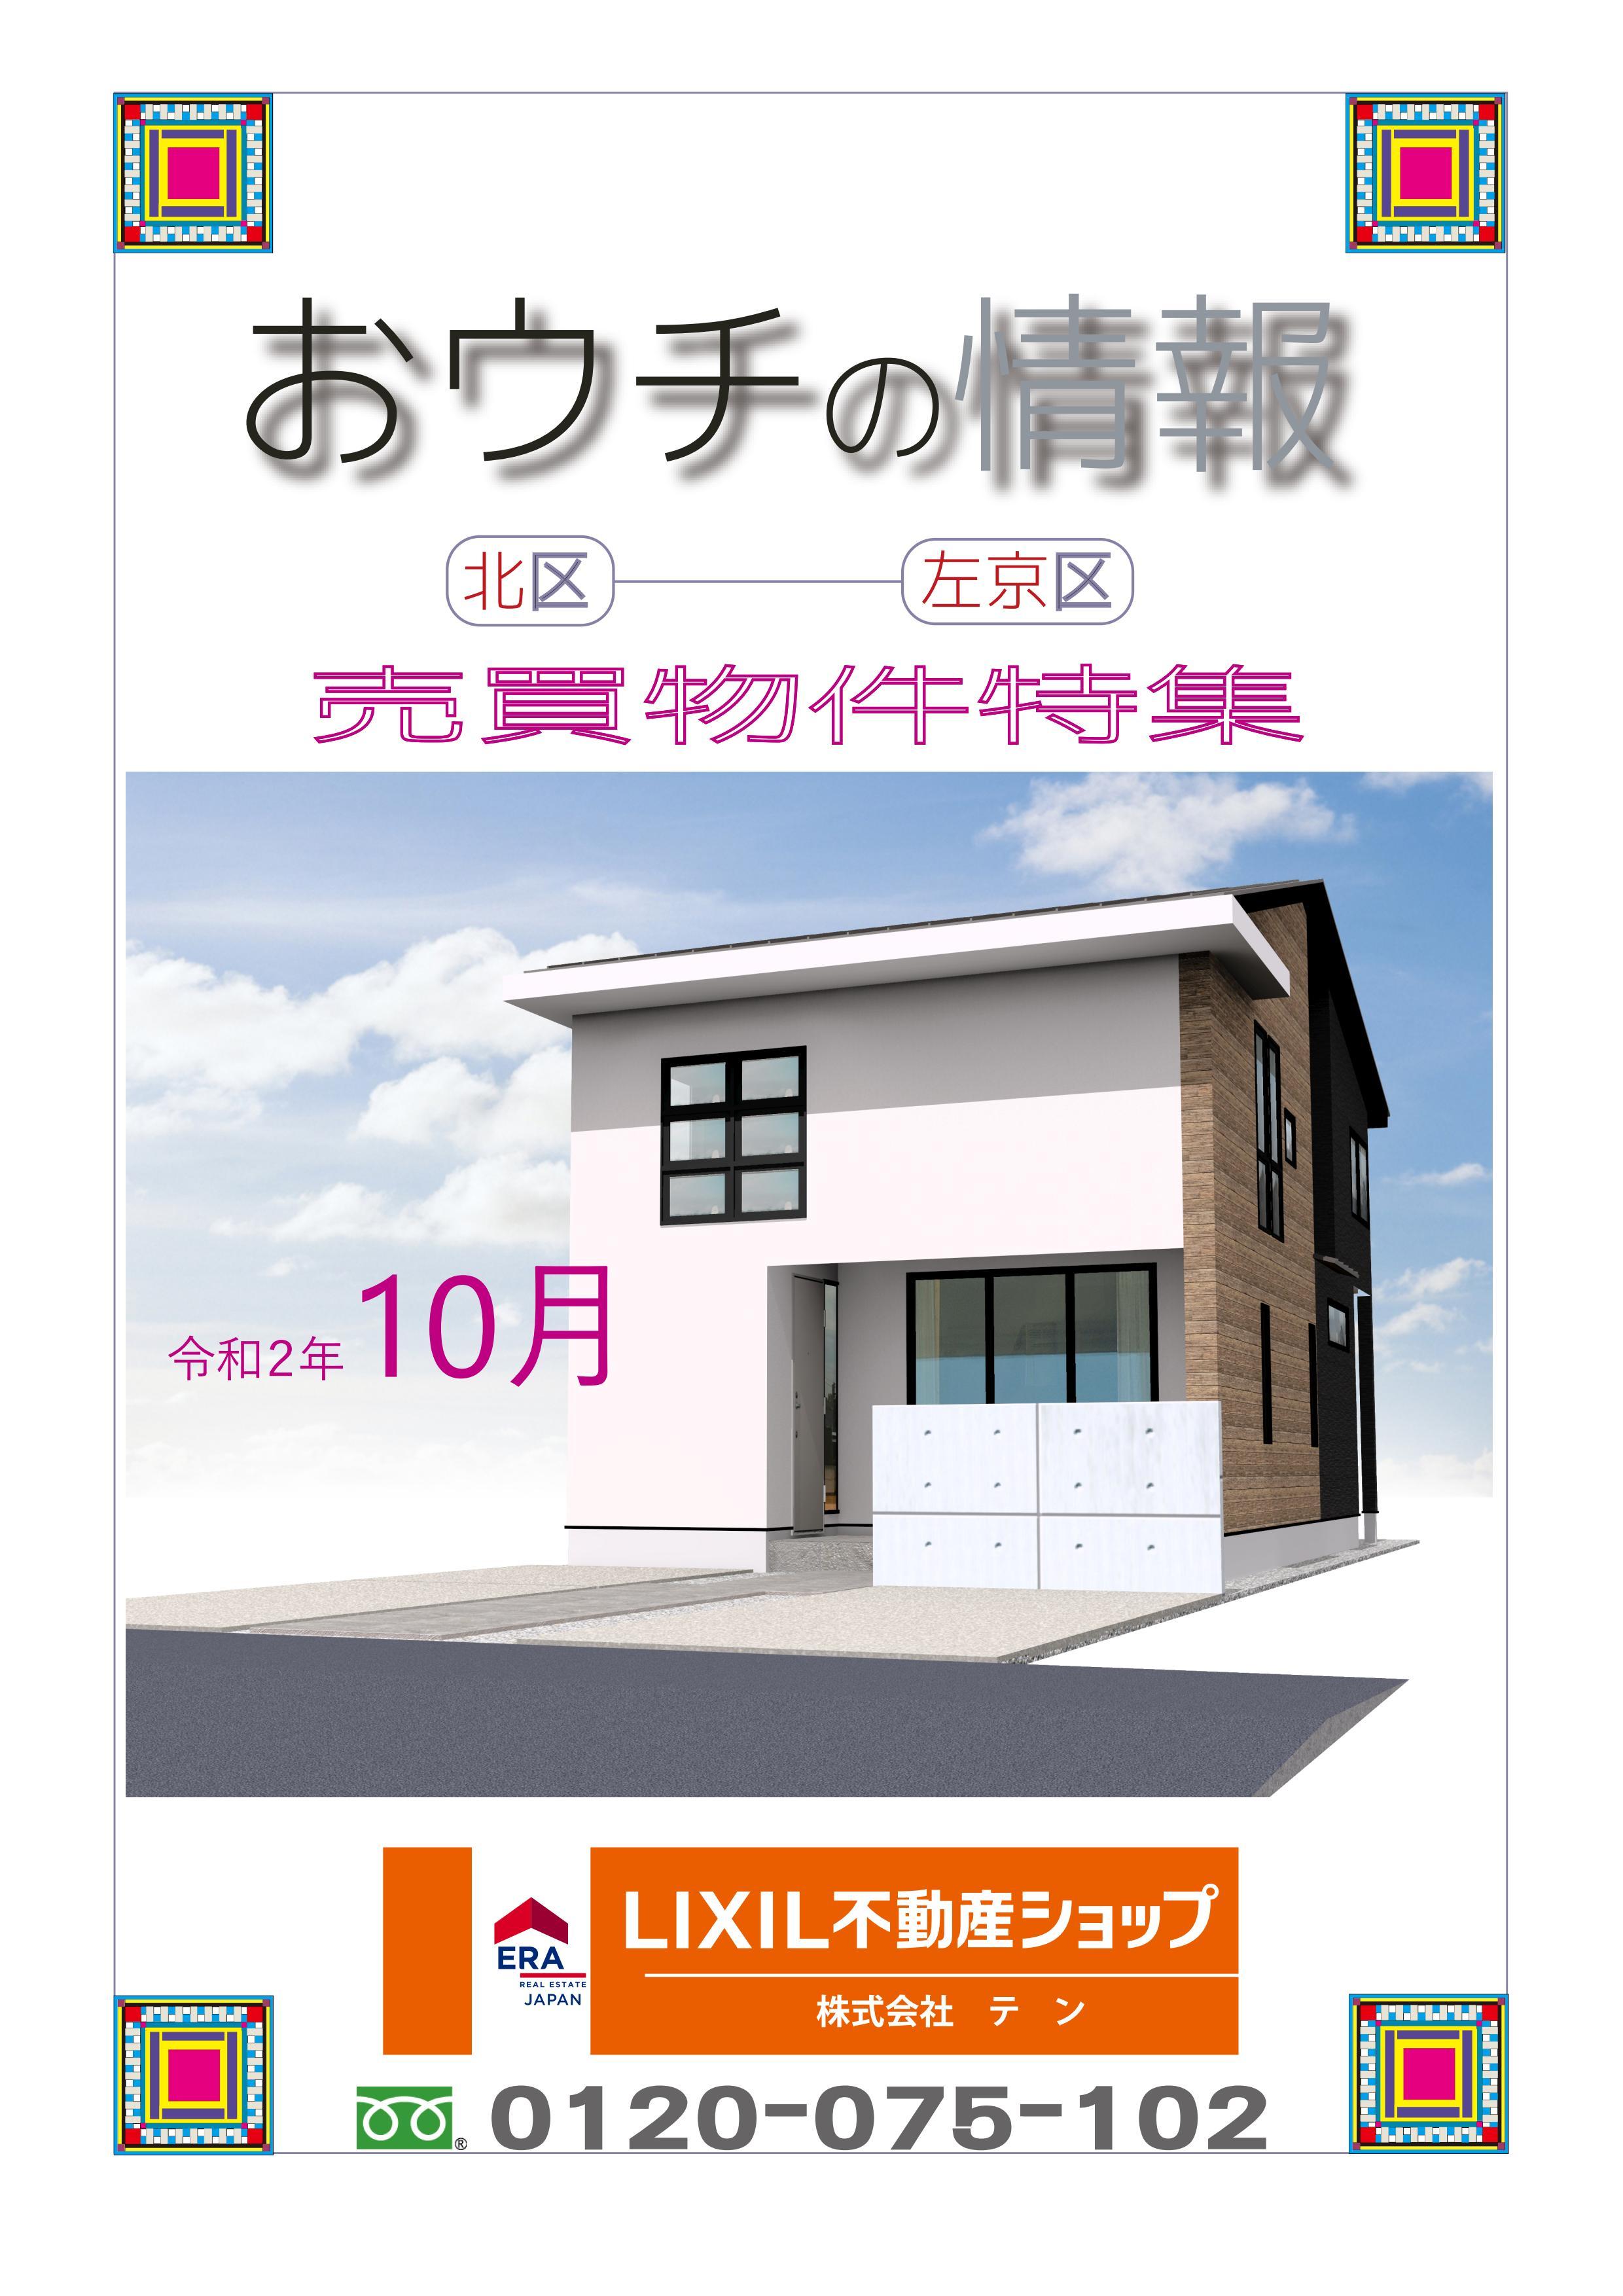 http://www.eraten.jp/blog/images/news/10%E6%9C%88.jpg